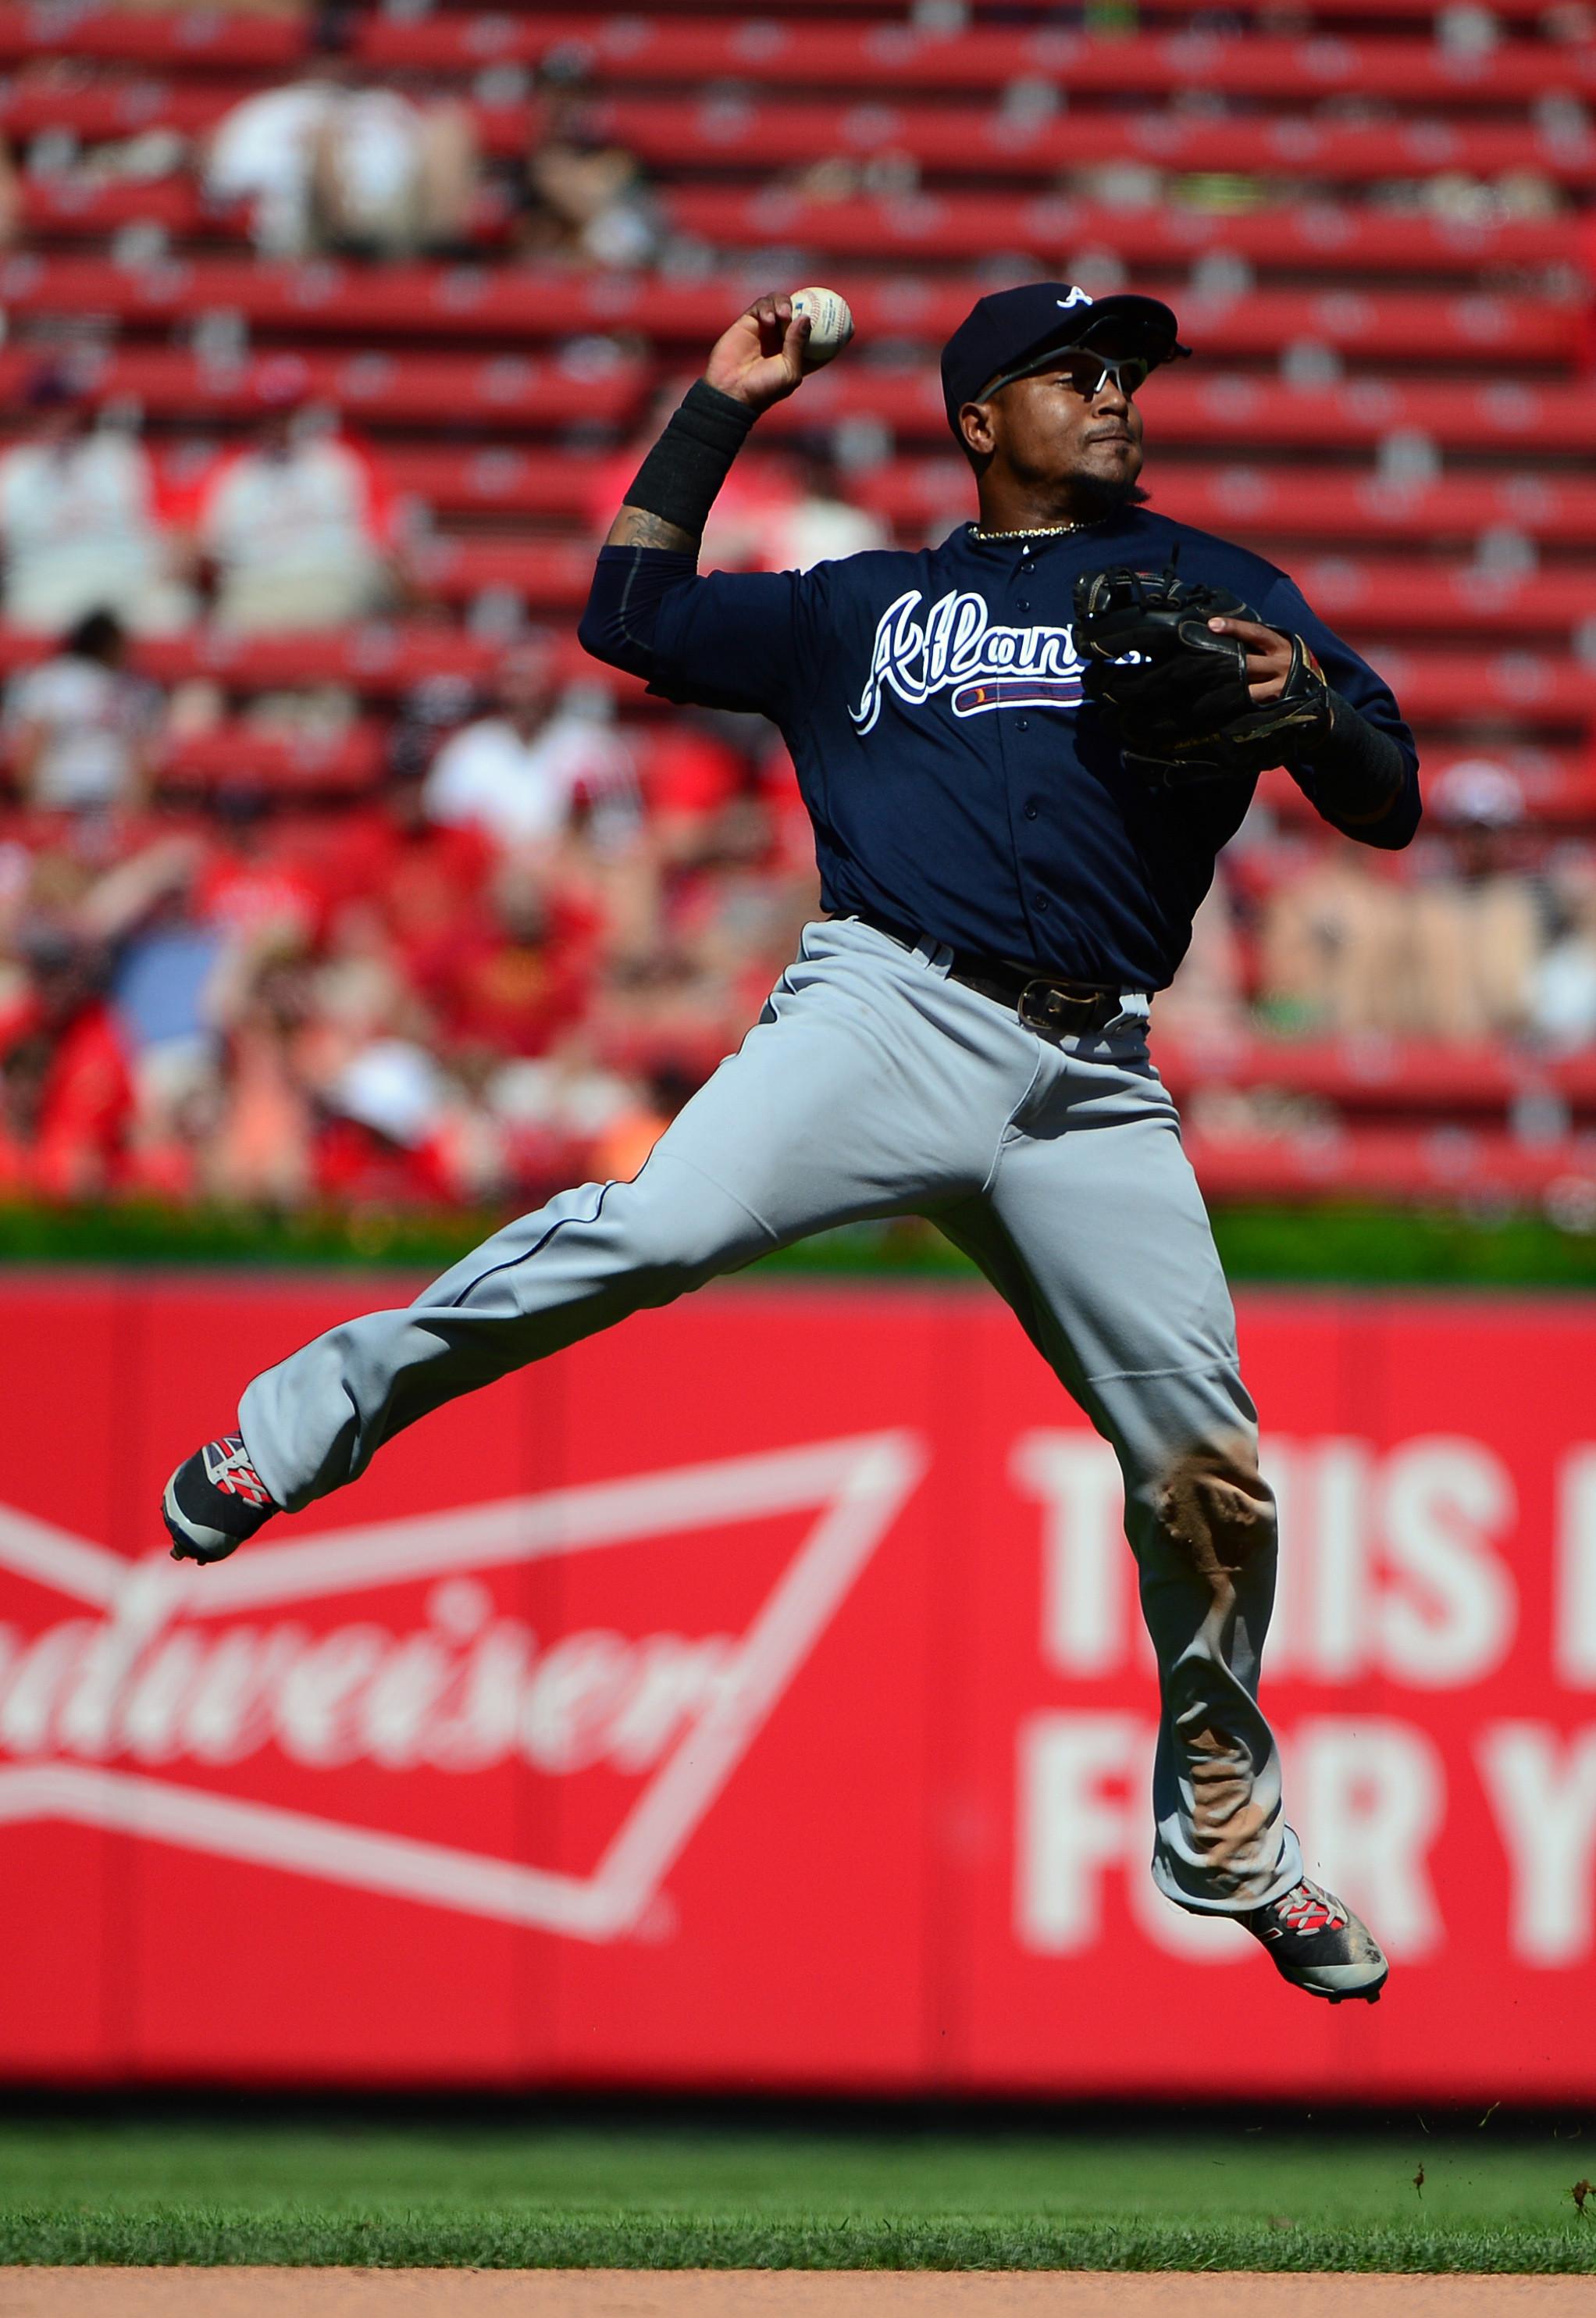 Aug 7, 2016; St. Louis, MO, USA; Atlanta Braves shortstop